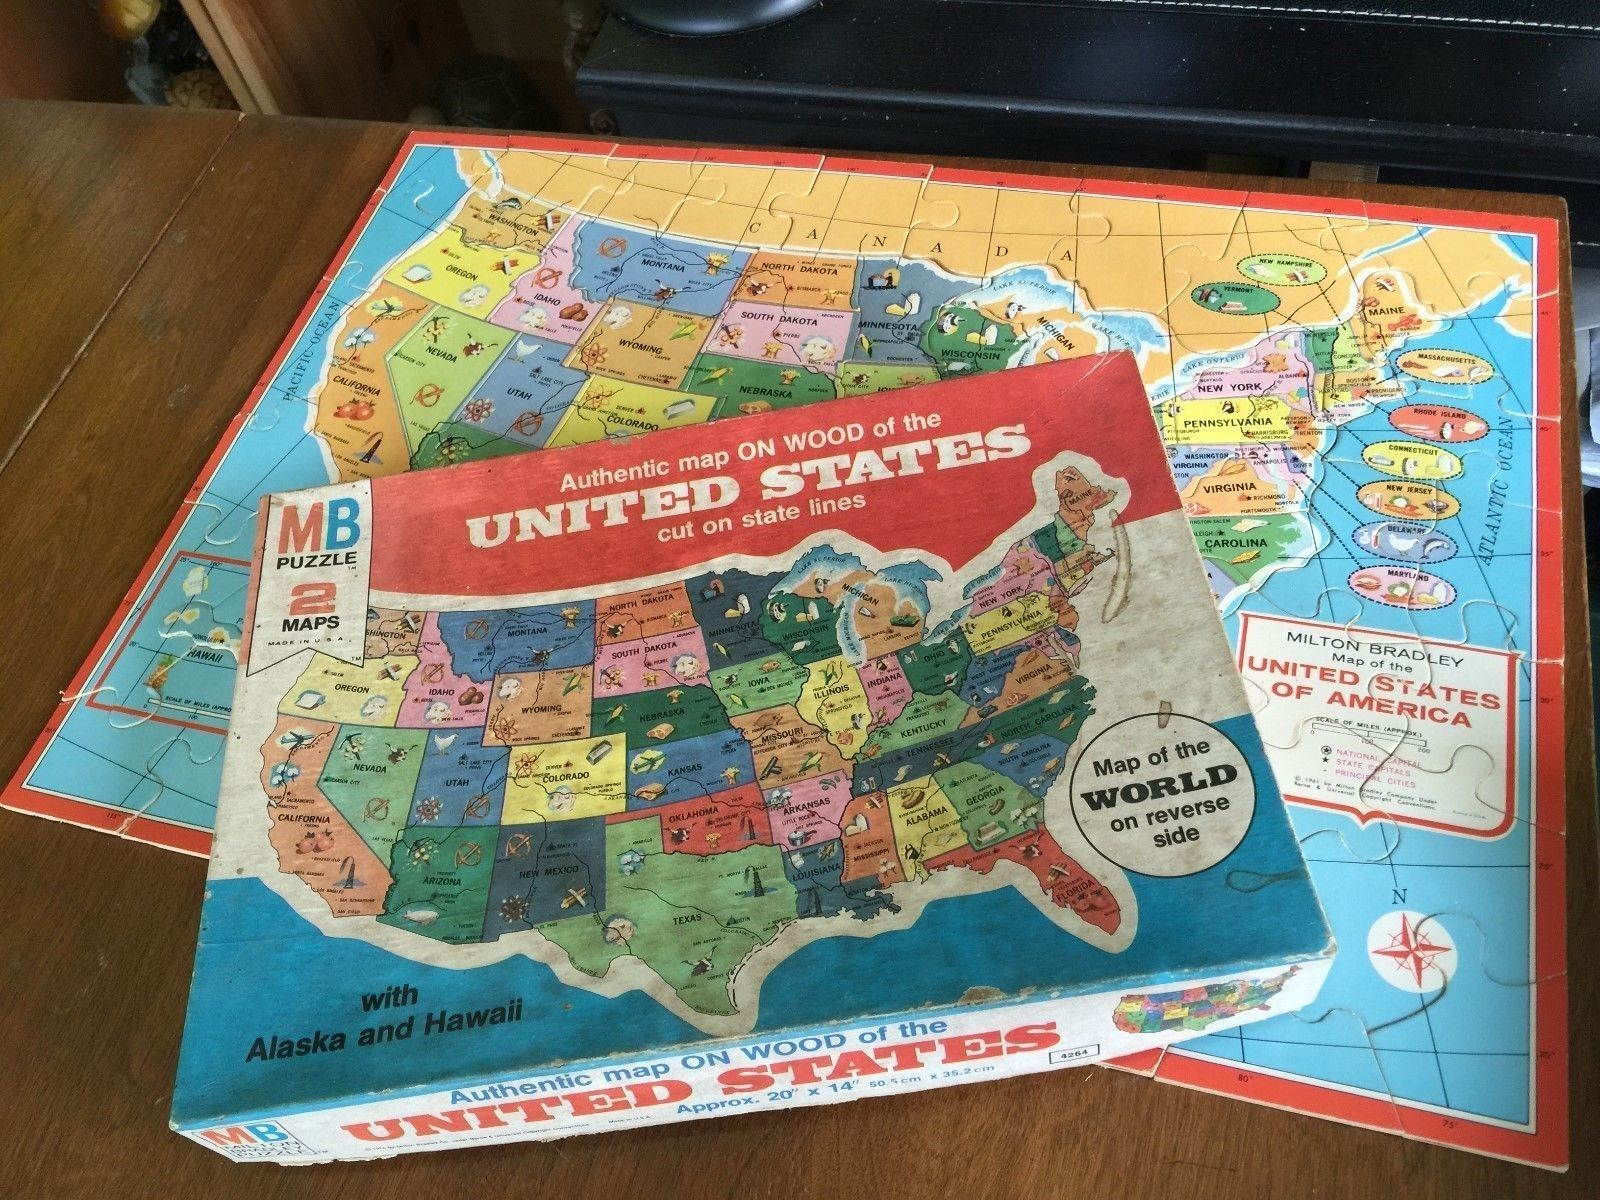 Playskool USA map puzzle featuring the MidAtlantic states New